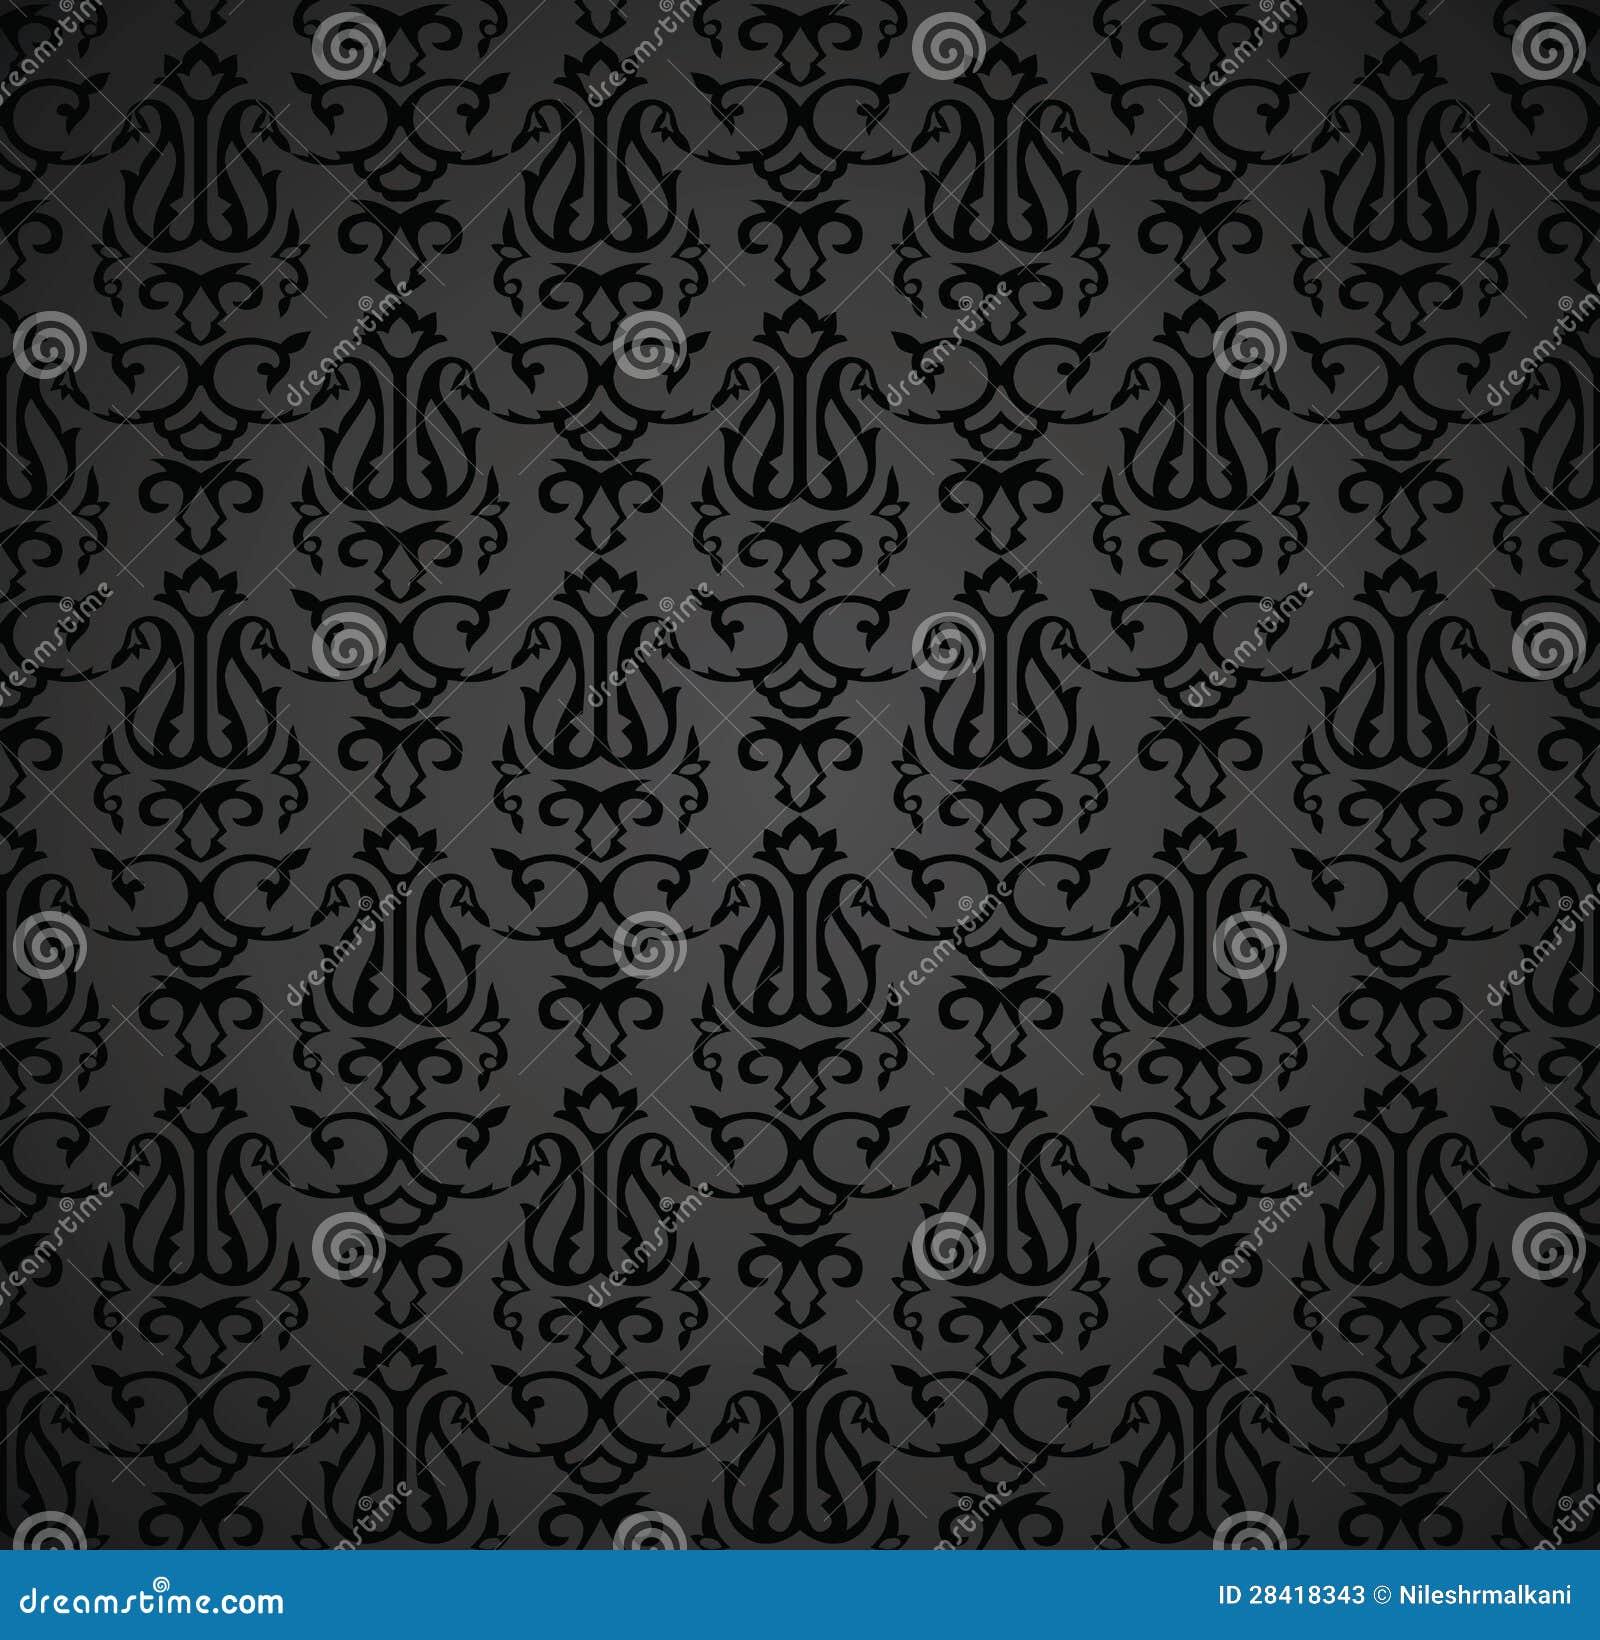 Black Book Cover Design : Black royal note book cover design stock vector image